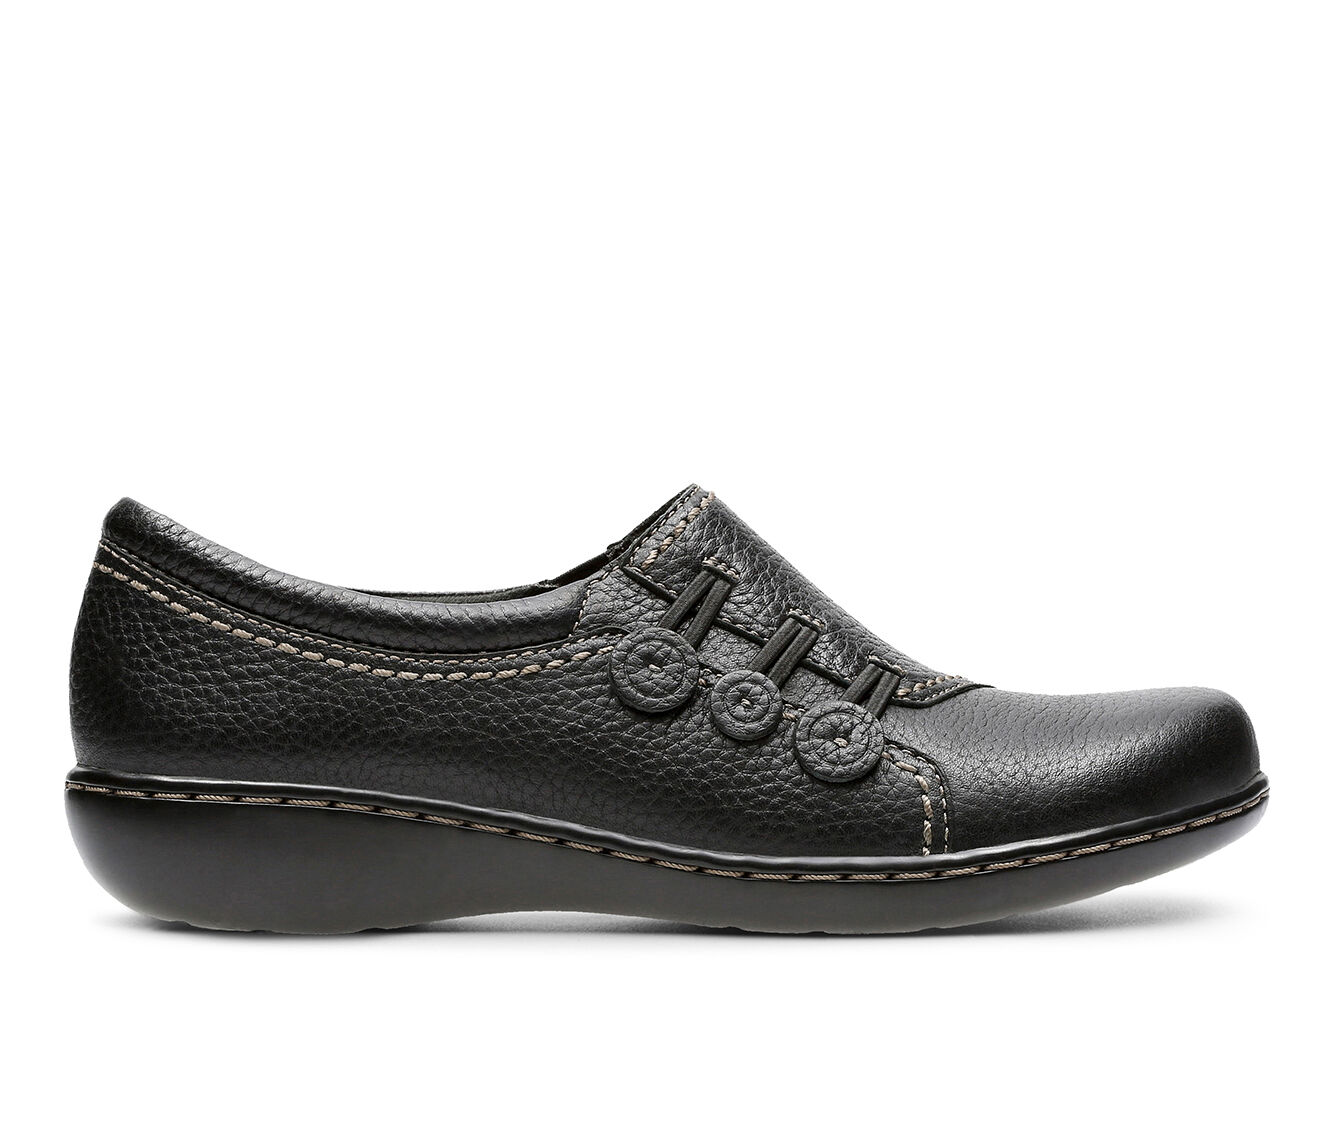 Clarks Ashland Effie | Shoe Carnival